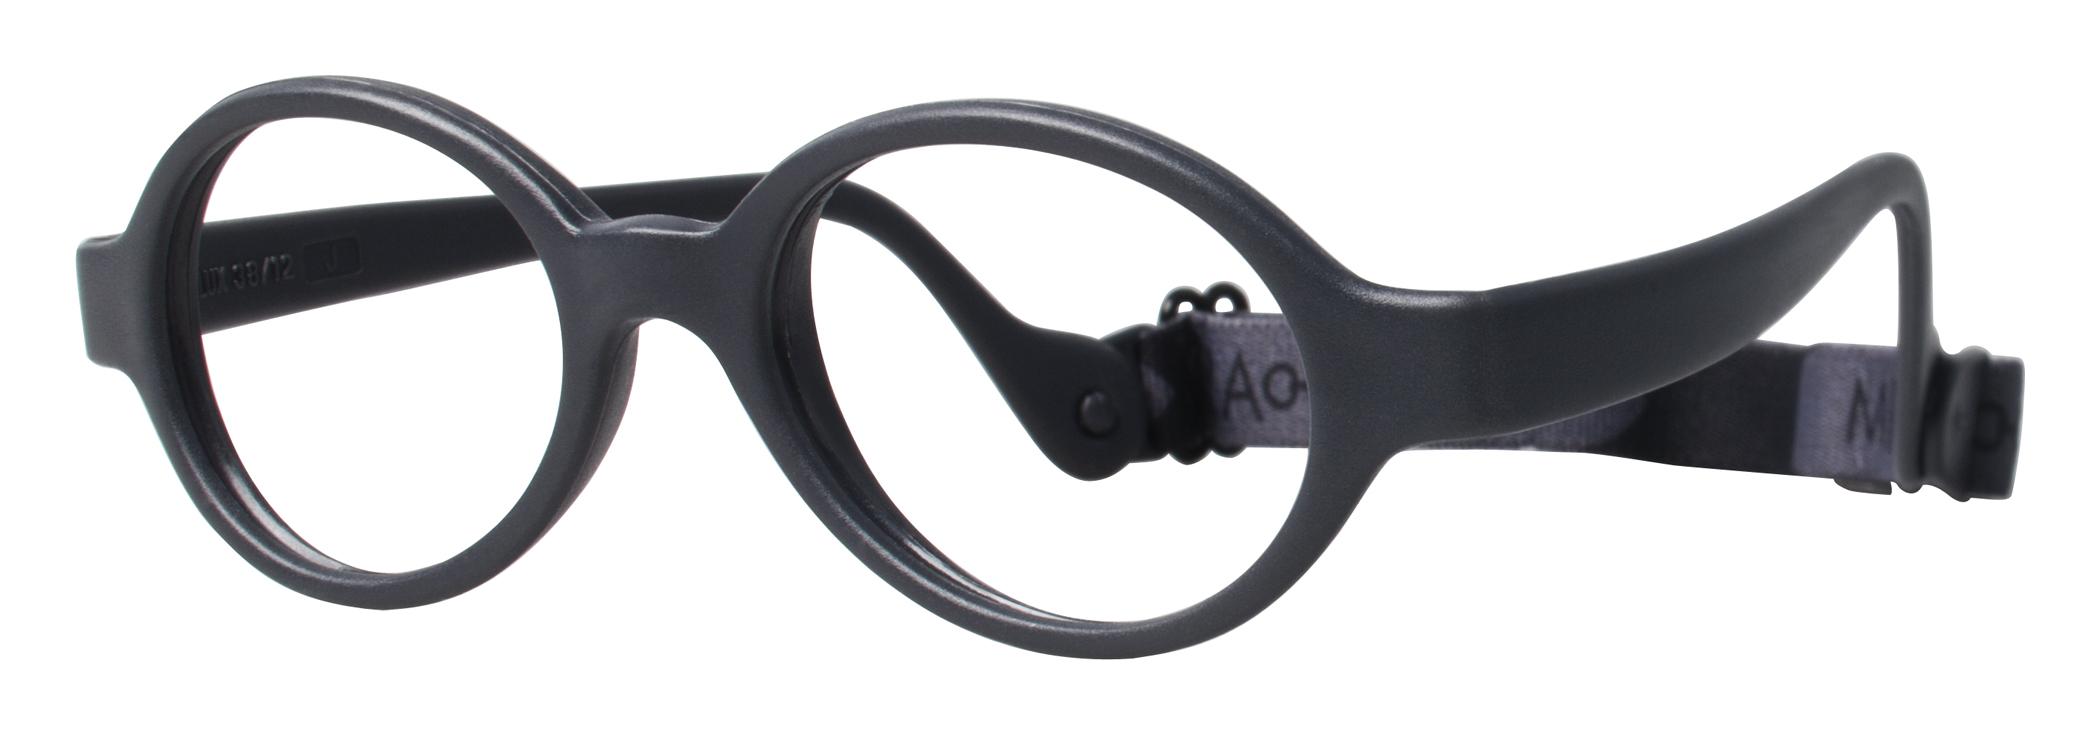 f0e85ae5ad9 Eyewear for Kids - Gray - Optiwow